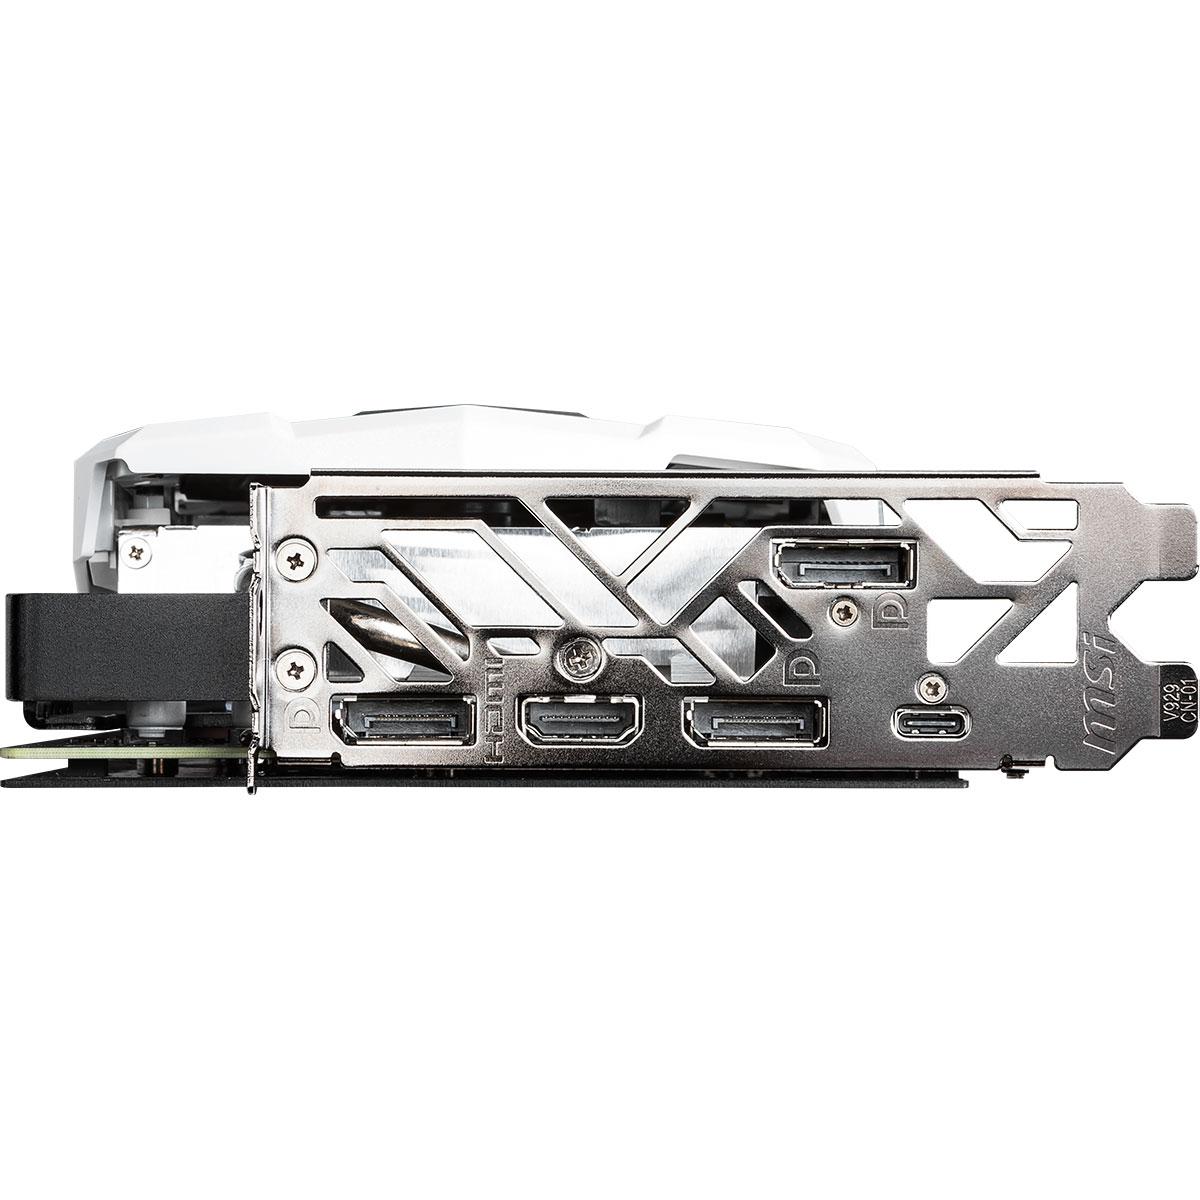 GeForce RTX 2070 ARMOR 8G OC (912-V373-226 --) - Achat / Vente Carte graphique sur Picata.fr - 1